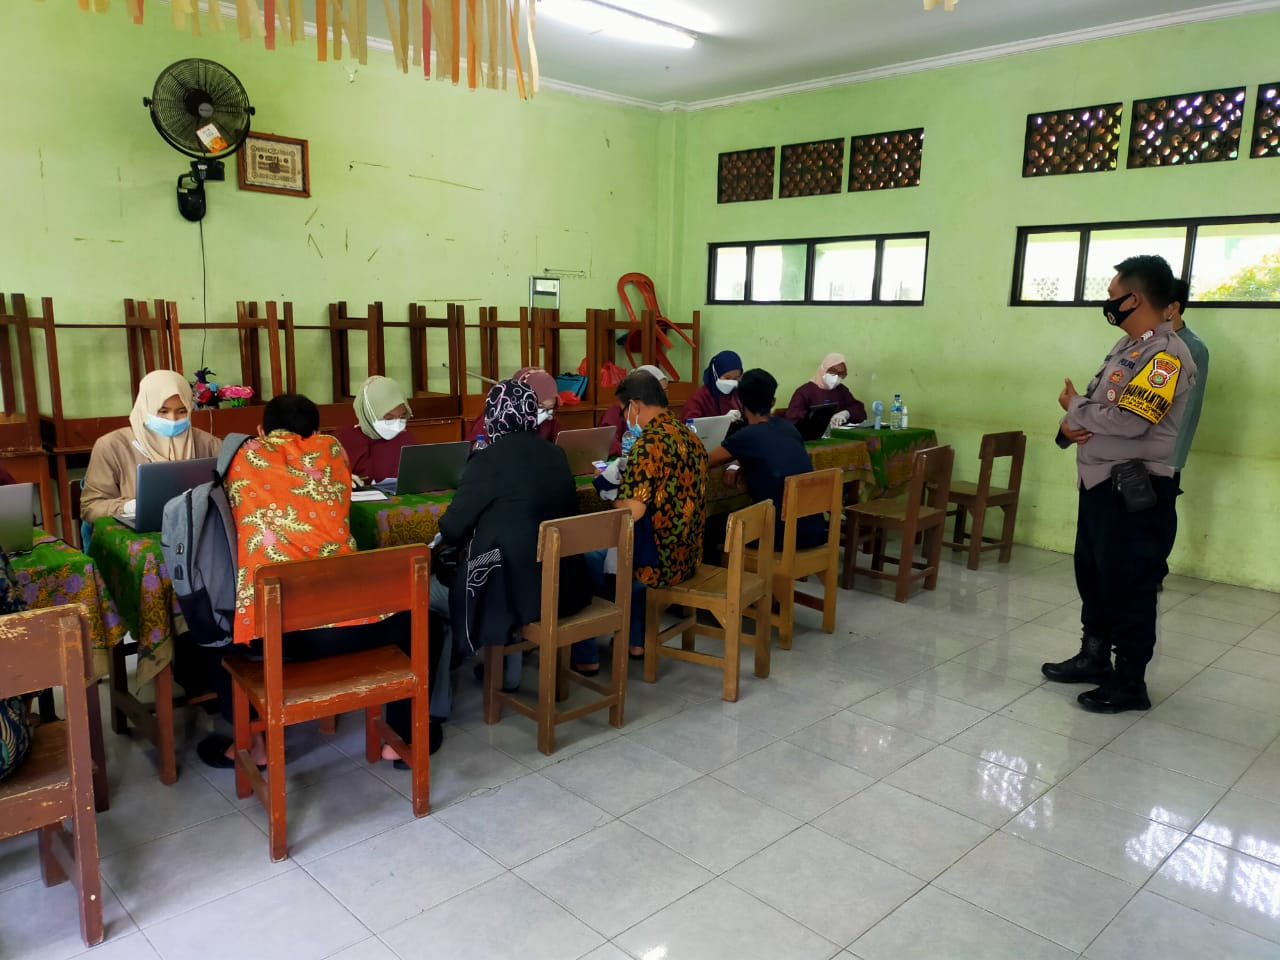 Sebanyak 230 orang guru tingkat Sekolah Dasar (SD) hingga Sekolah Menengah Atas (SMA) di Kecamatan Cikarang Utara Kabupaten Bekasi mulai menjalani vaksinasi tahap pertama.